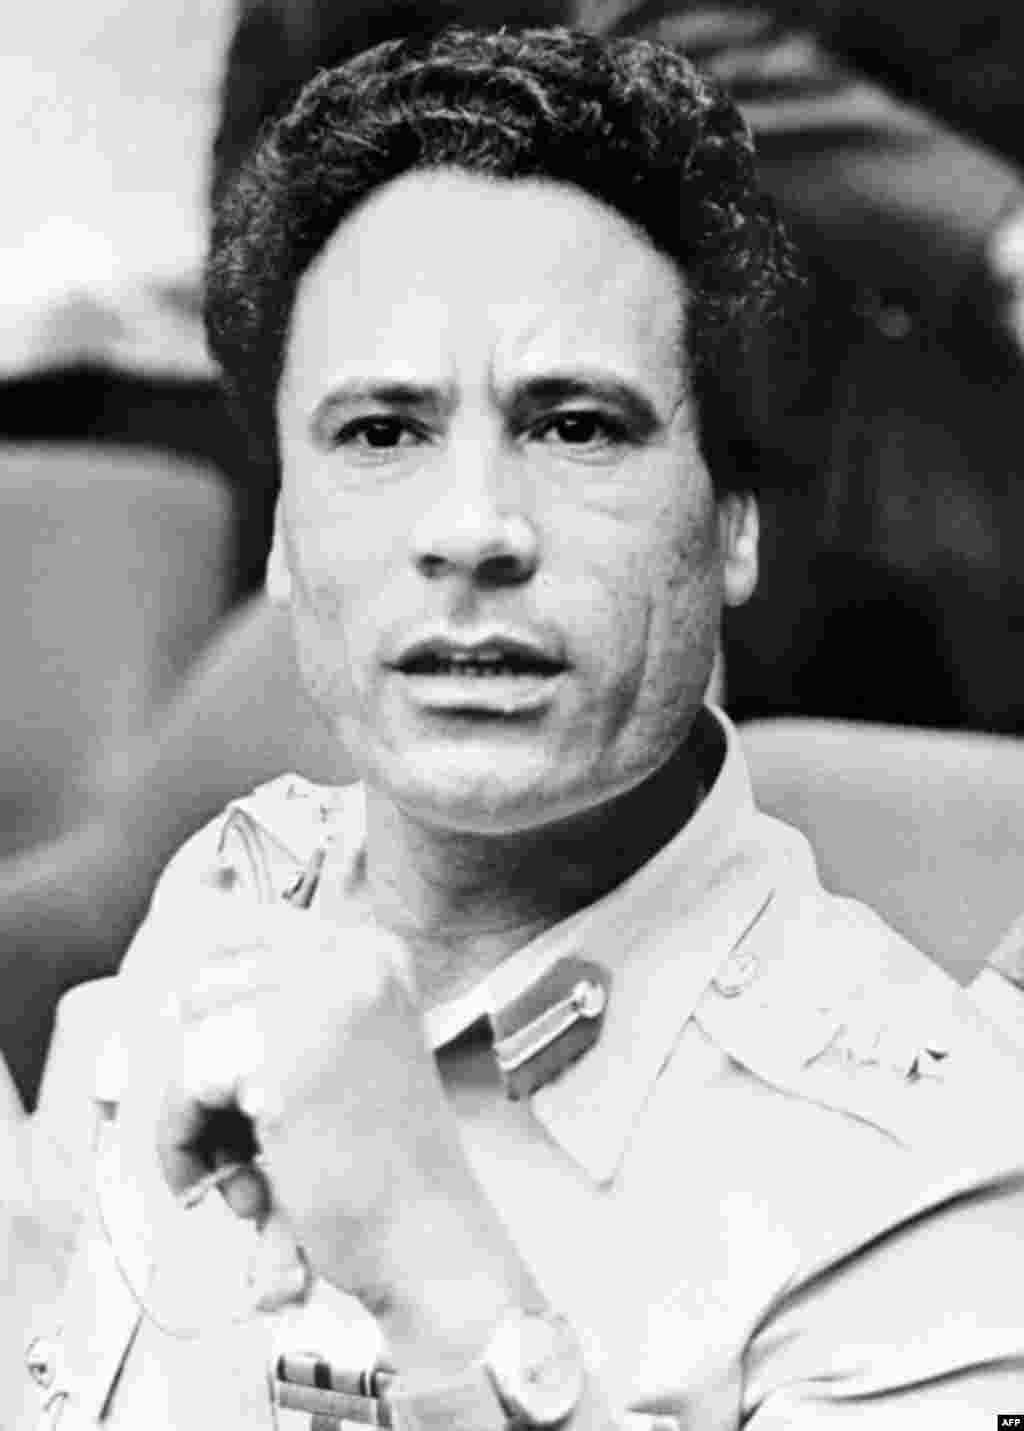 Муаммар Каддафи на саммите Организации Африканского Единства в Кампале 4 августа 1975 года